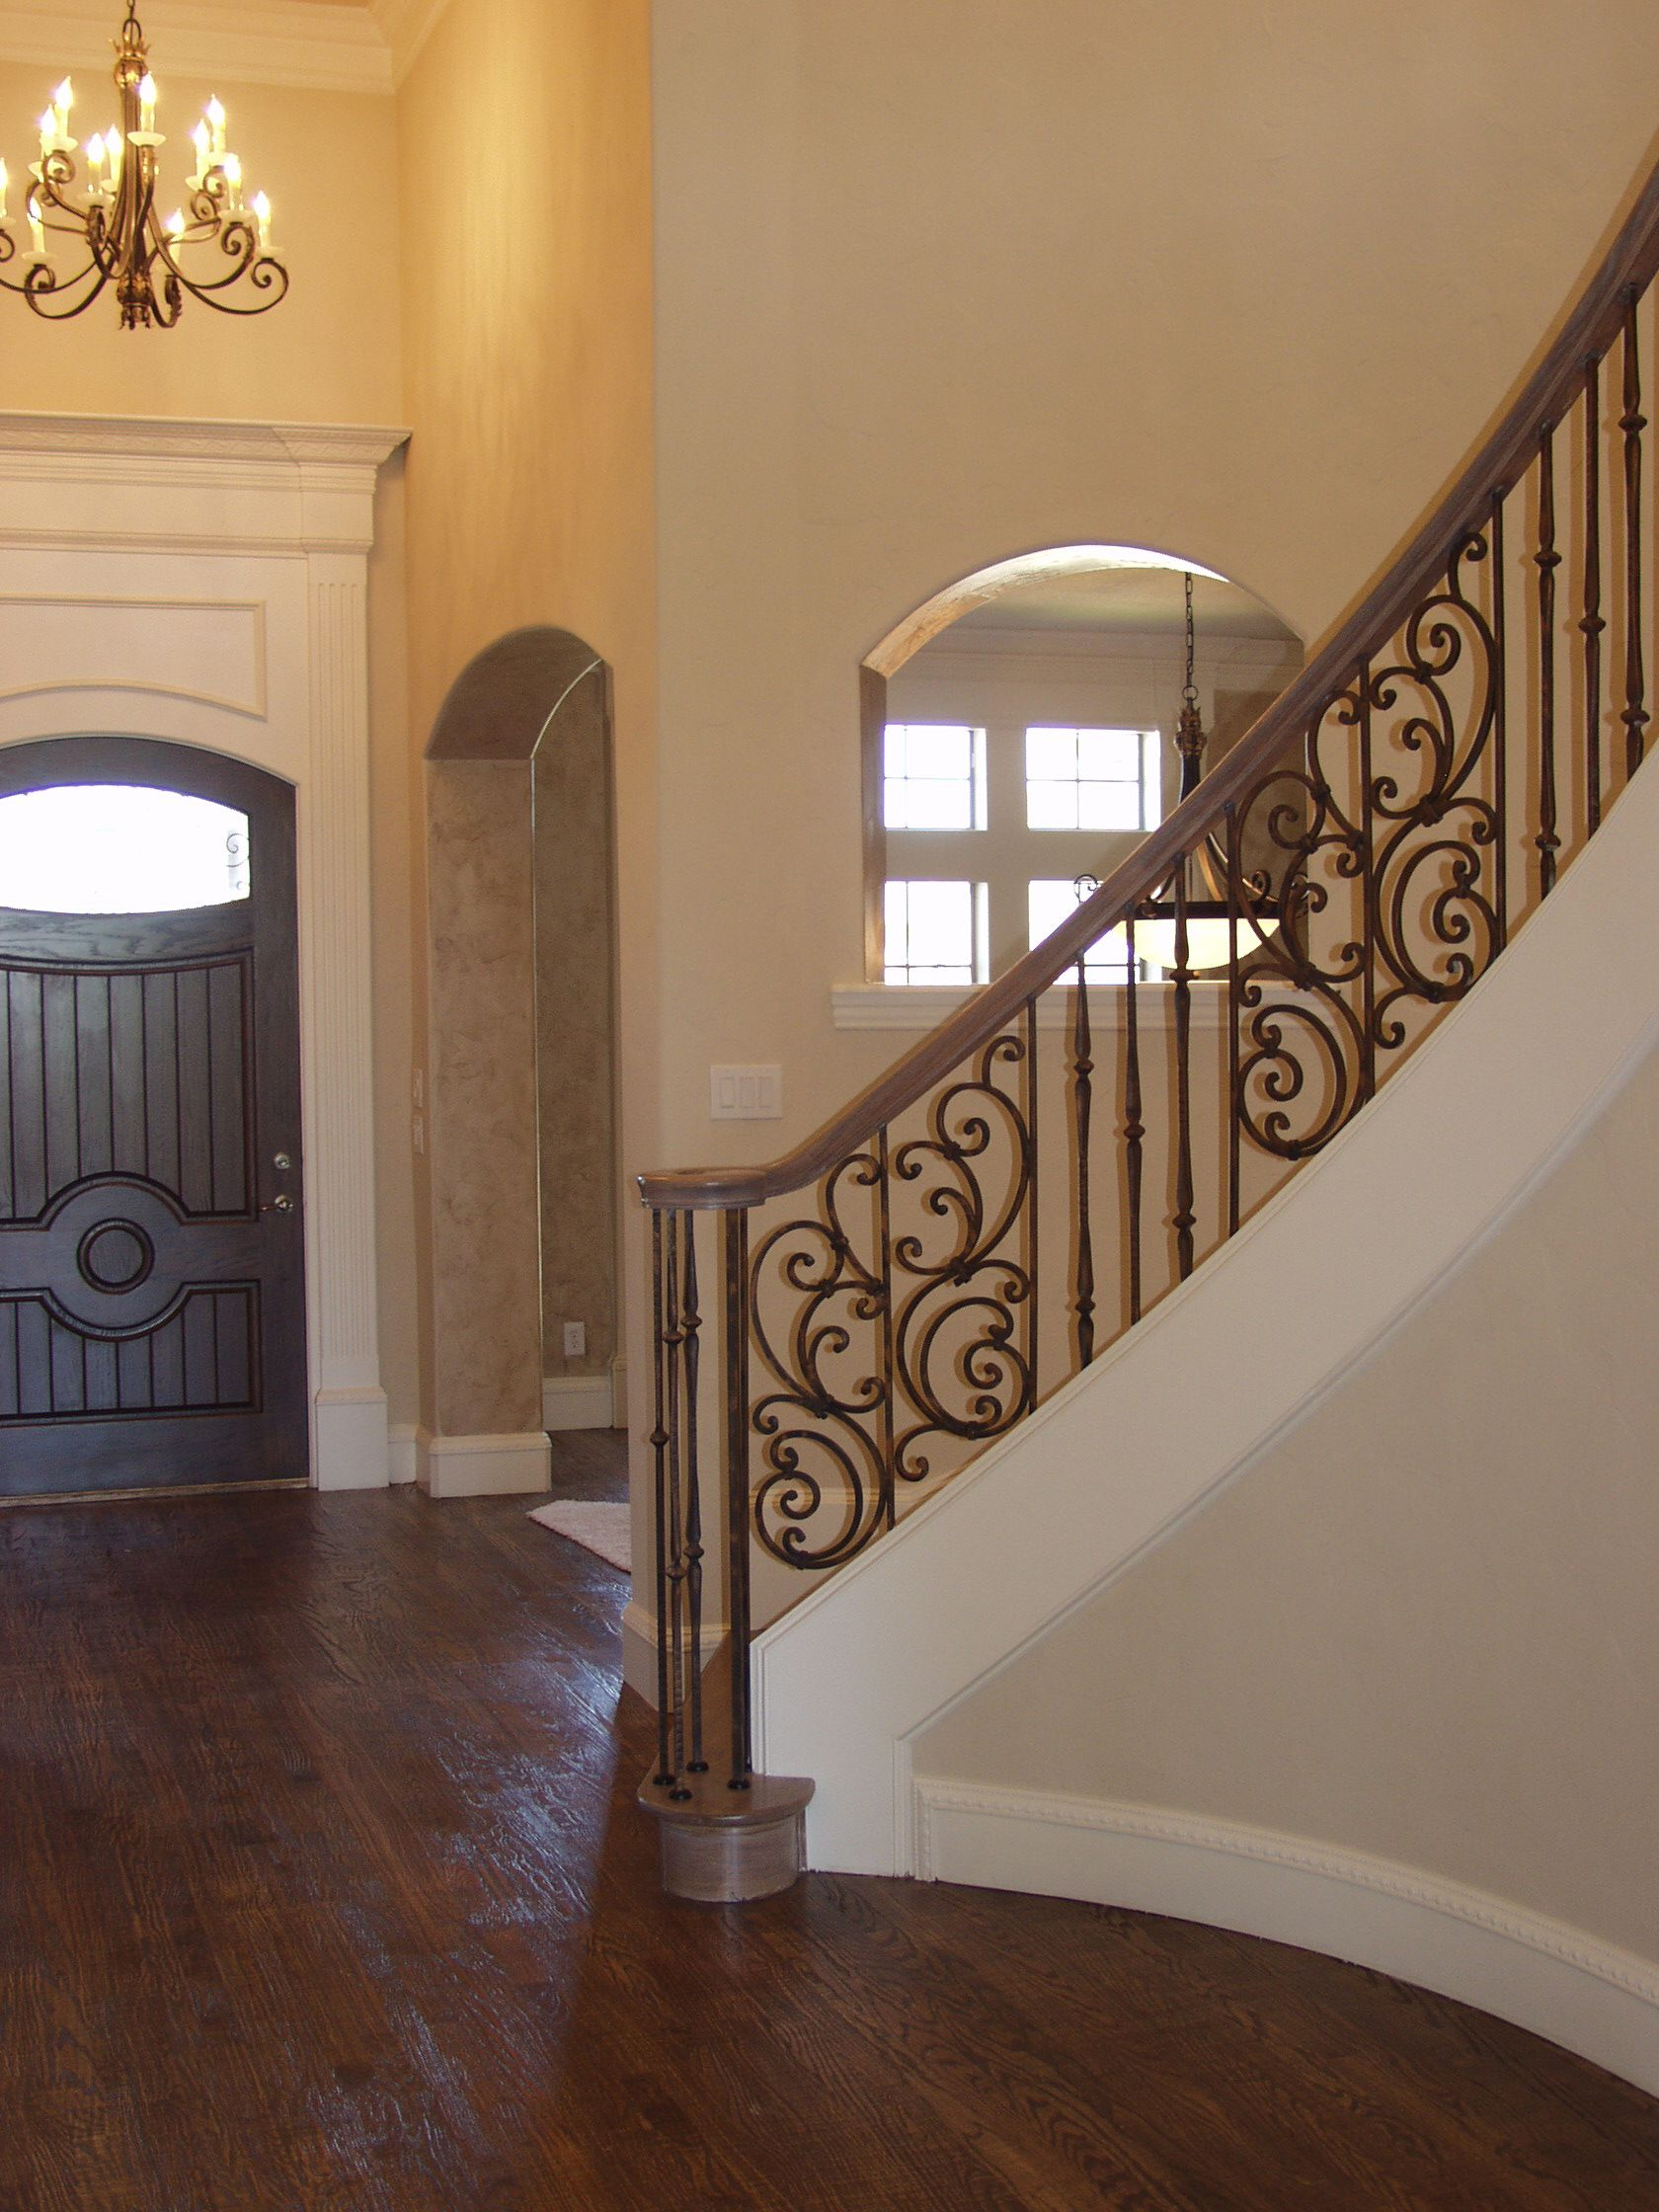 Stair Gallery Stairway Photos Wrought Iron Stair Railing Iron Stair Railing Wrought Iron Stairs